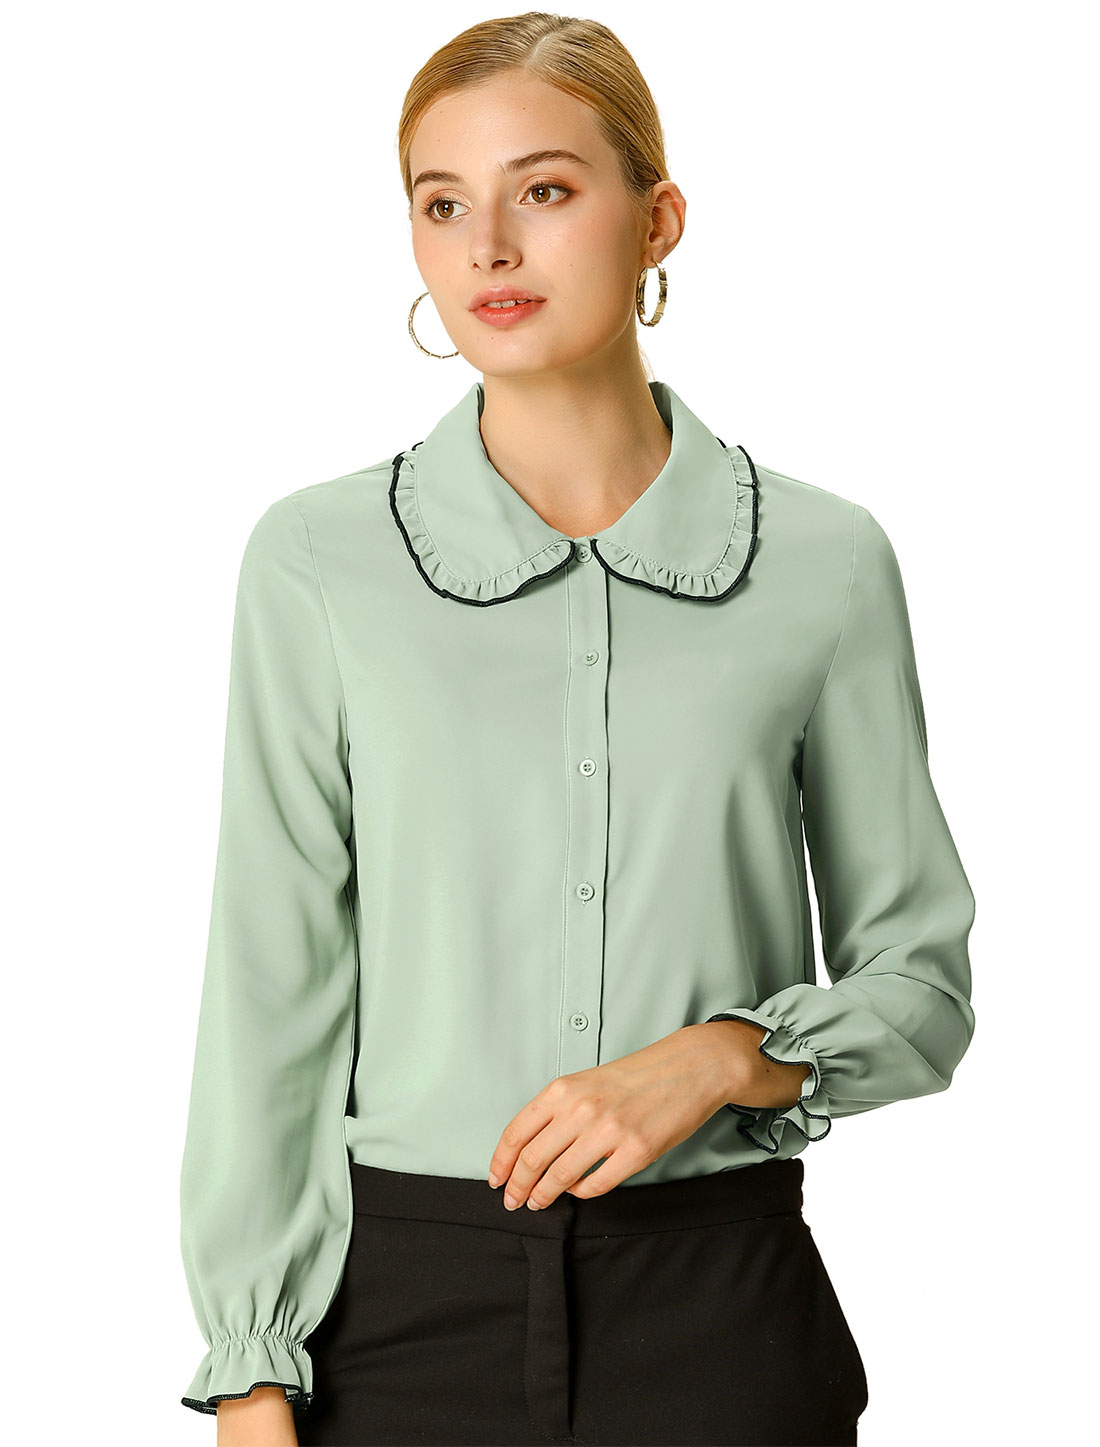 Women's Sweet Ruffle Peter Pan Collar Long Sleeves Button Up Shirt Green M